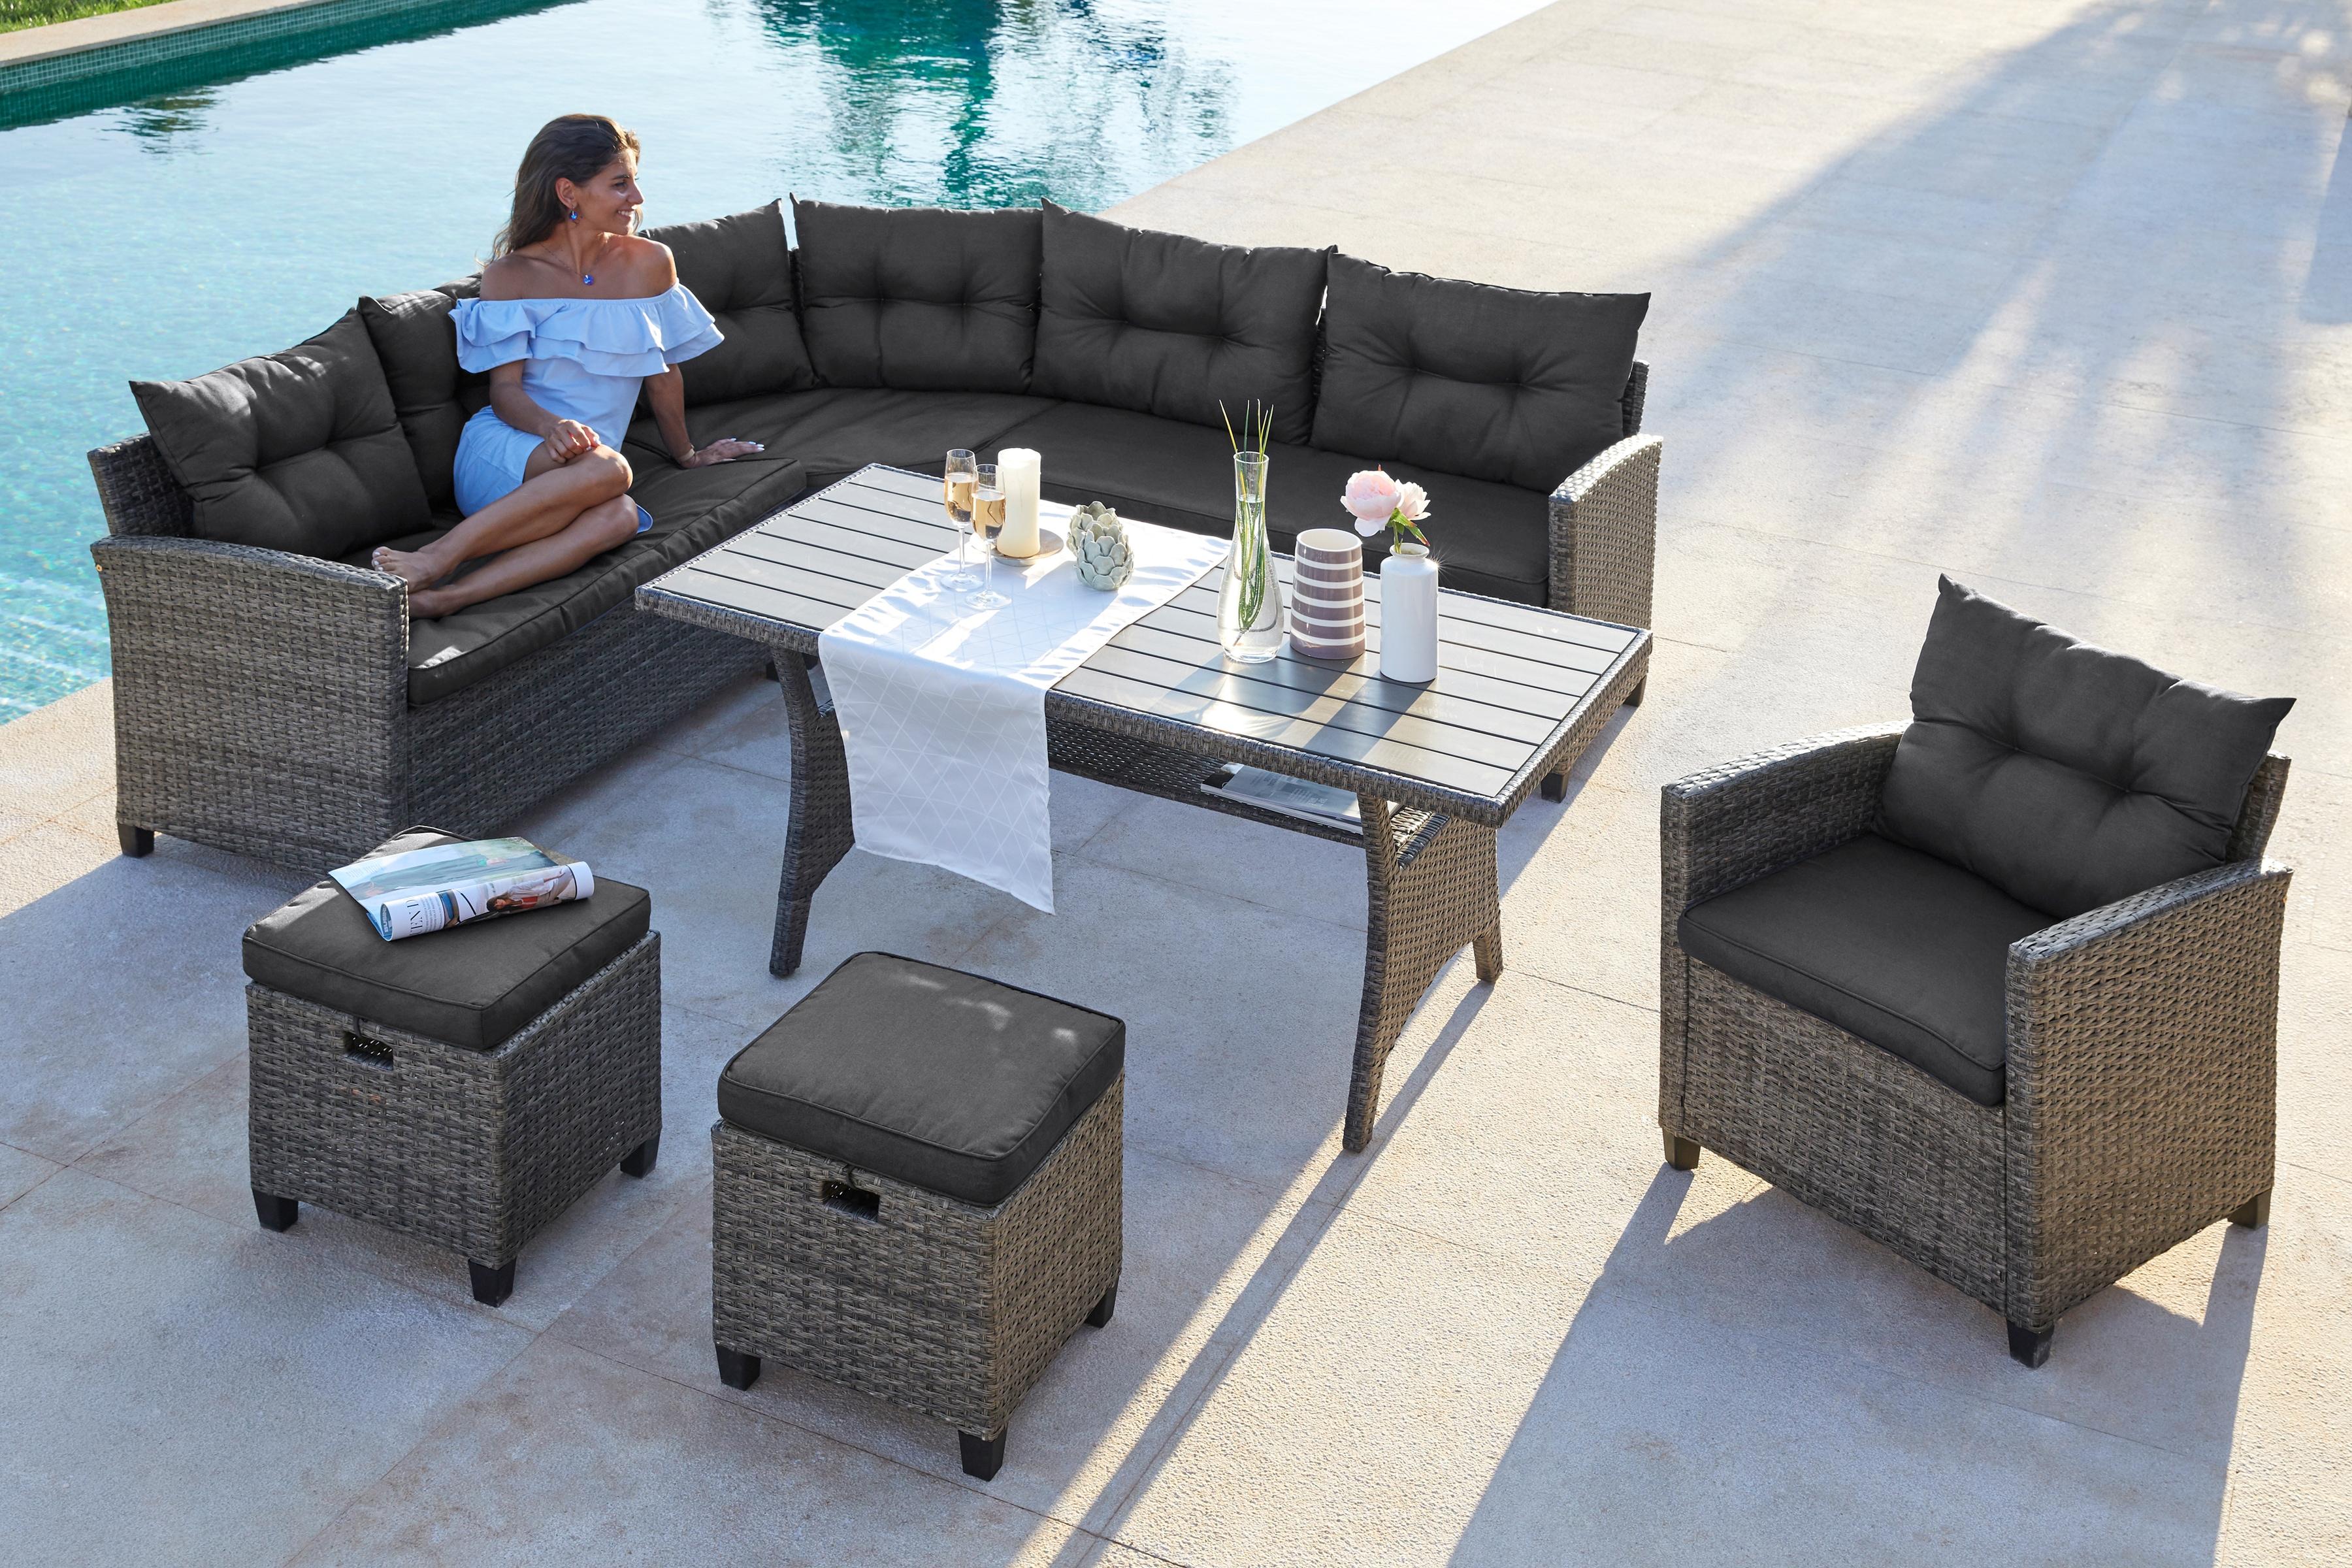 KONIFERA Loungeset Keros Premium 20-tlg Ecklounge 2 Hocker Sessel Tisch Polyrattan